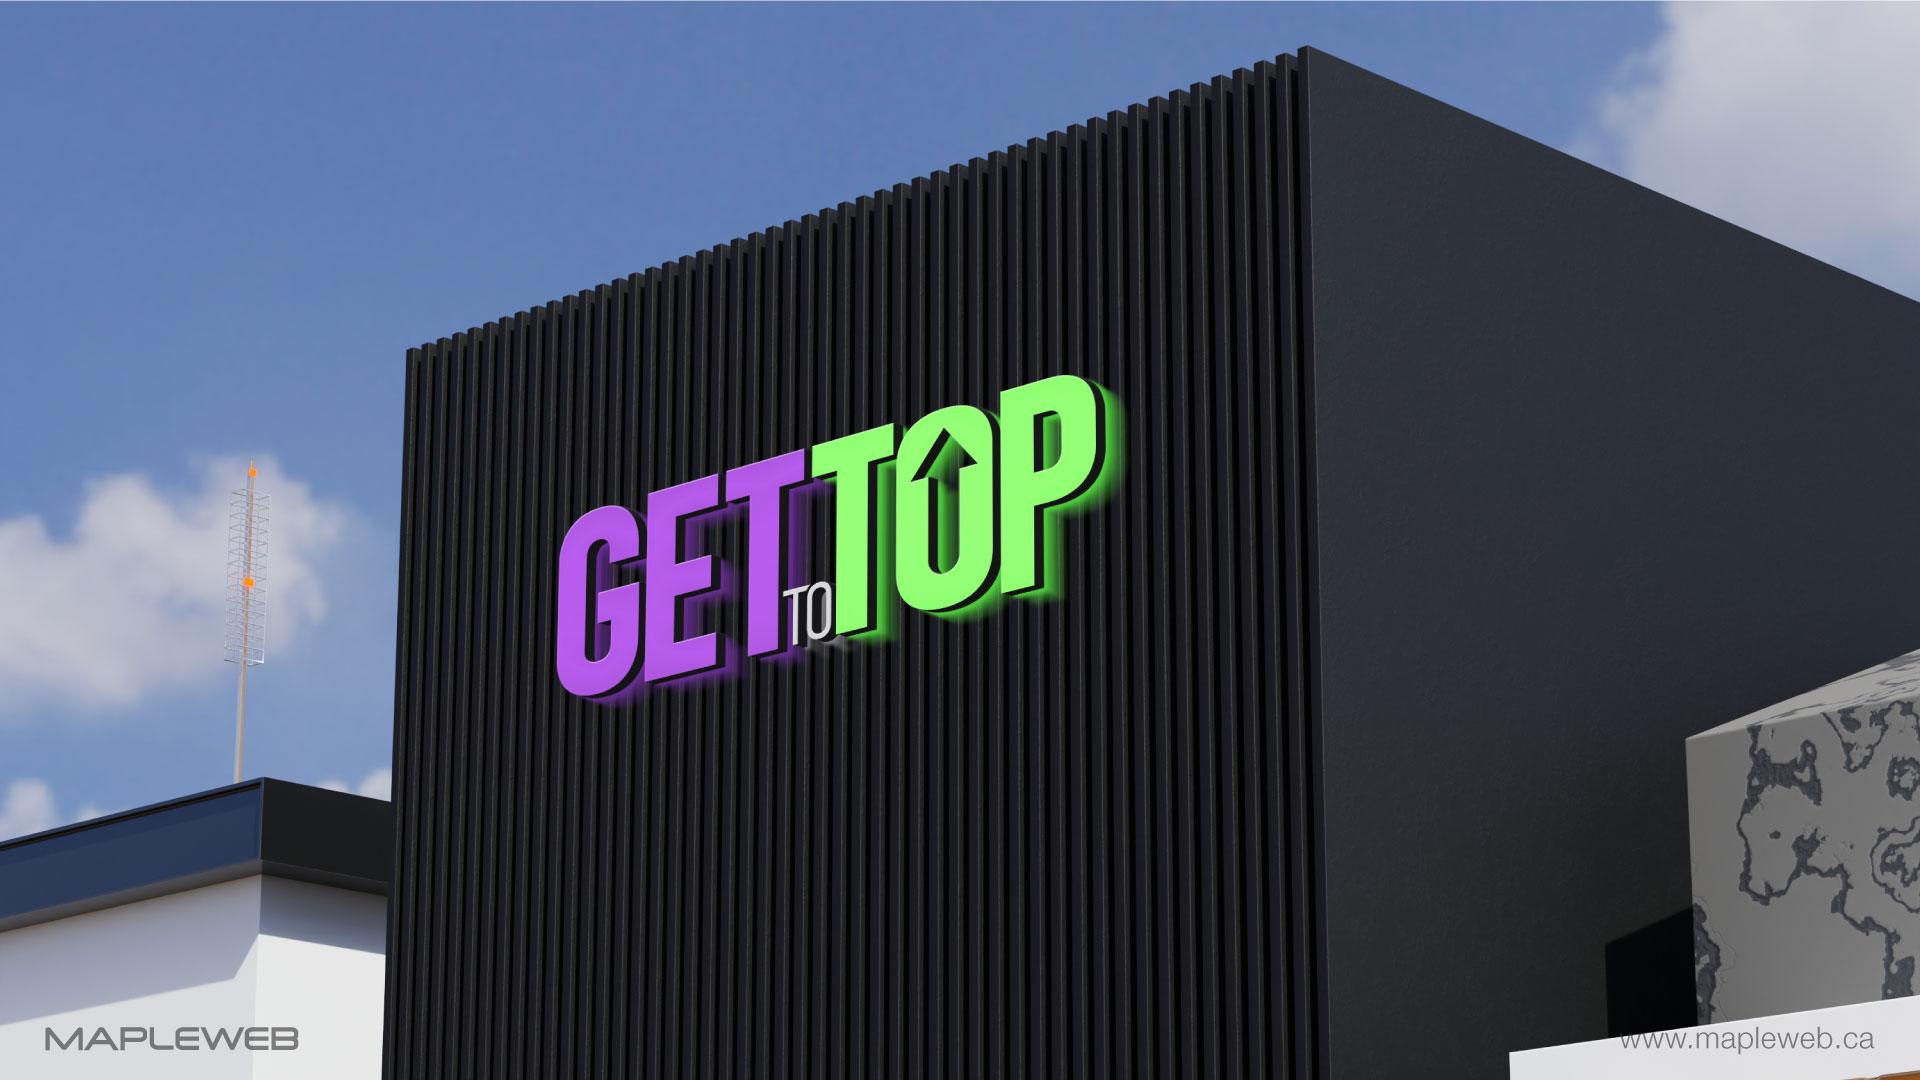 gettotop-brand-logo-design-by-mapleweb-vancouver-canada-black-building-mock